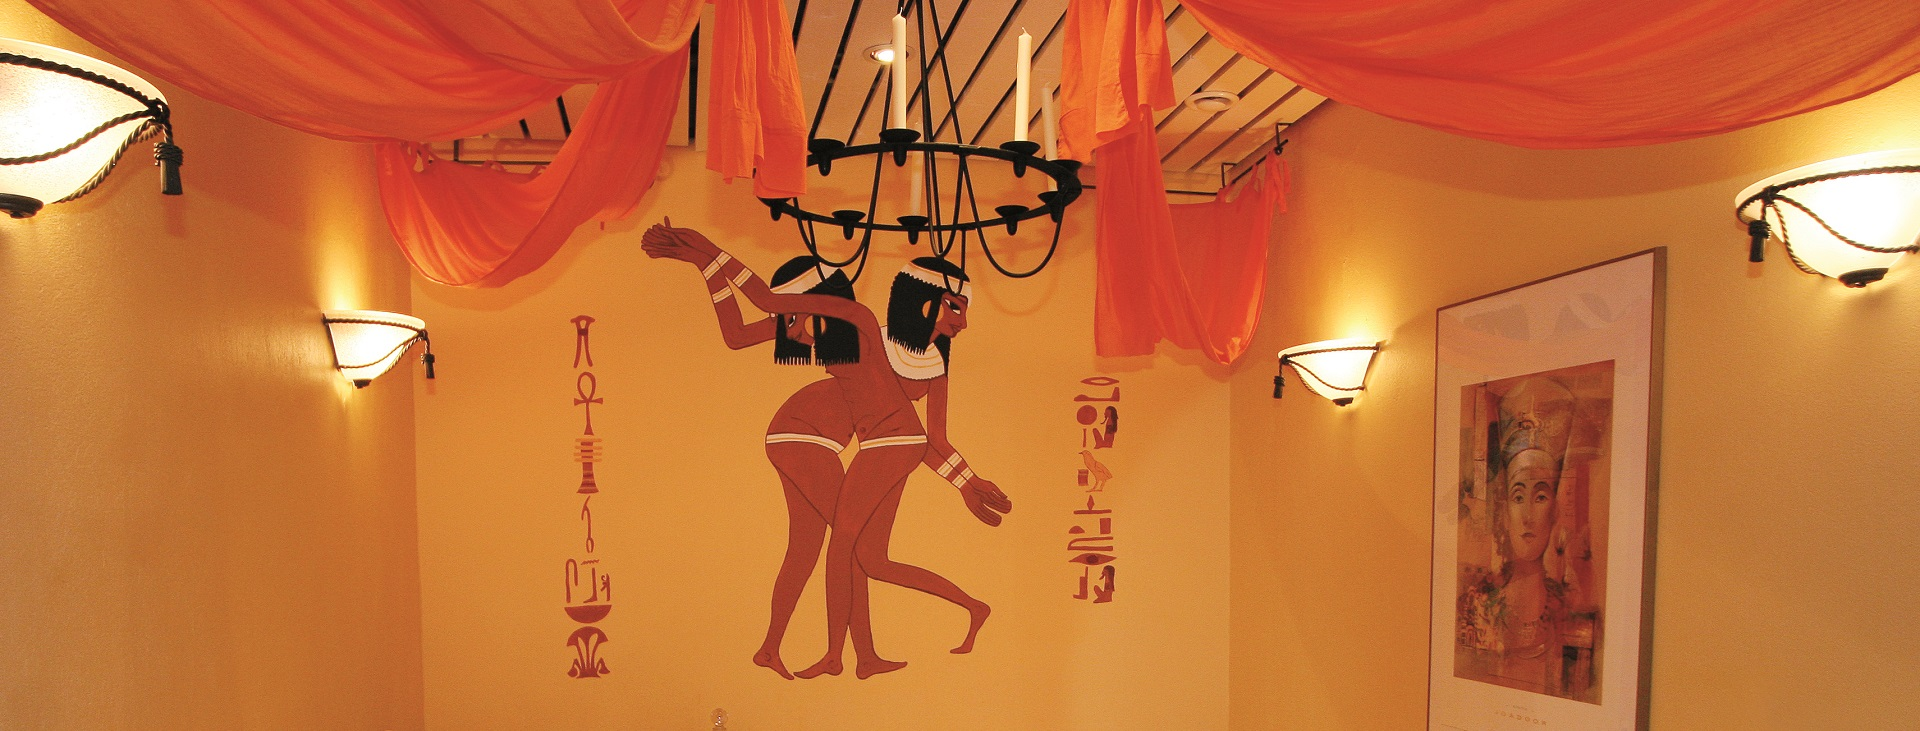 Cleopatra-Pflege im Syltness Center